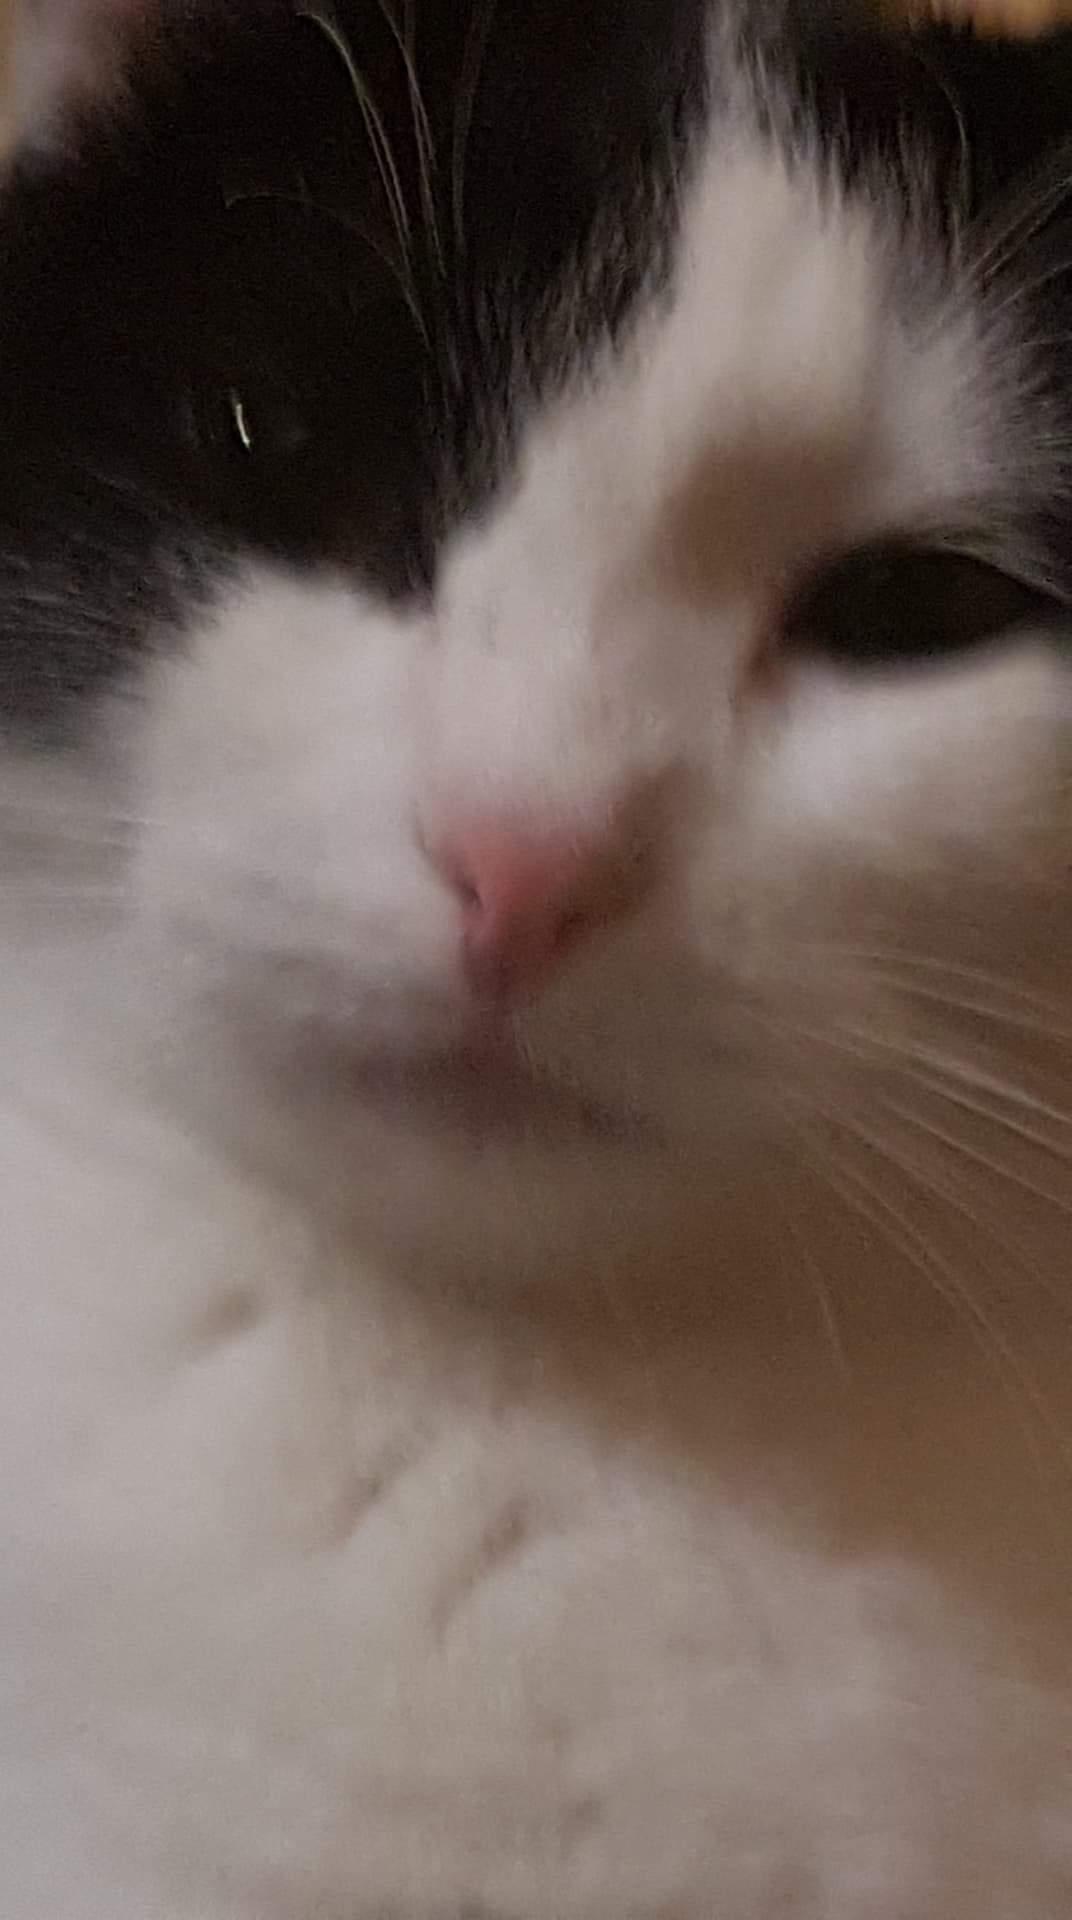 Download Adorable Cat Pictures Photos Images tadQ_zvrX